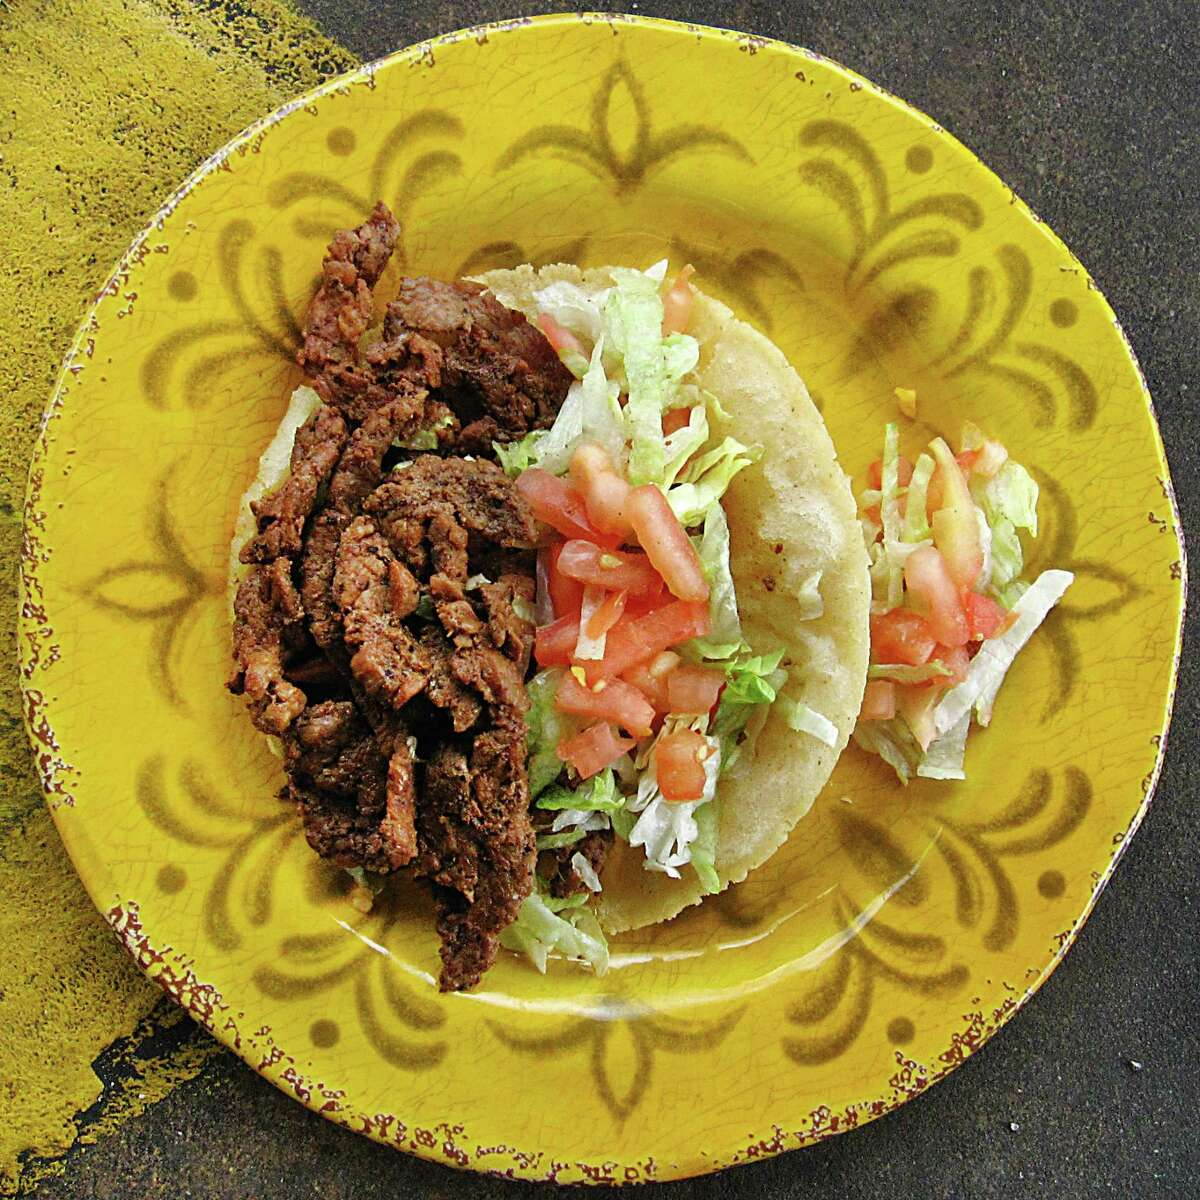 Beef fajita puffy taco from Oscar's Taco House.